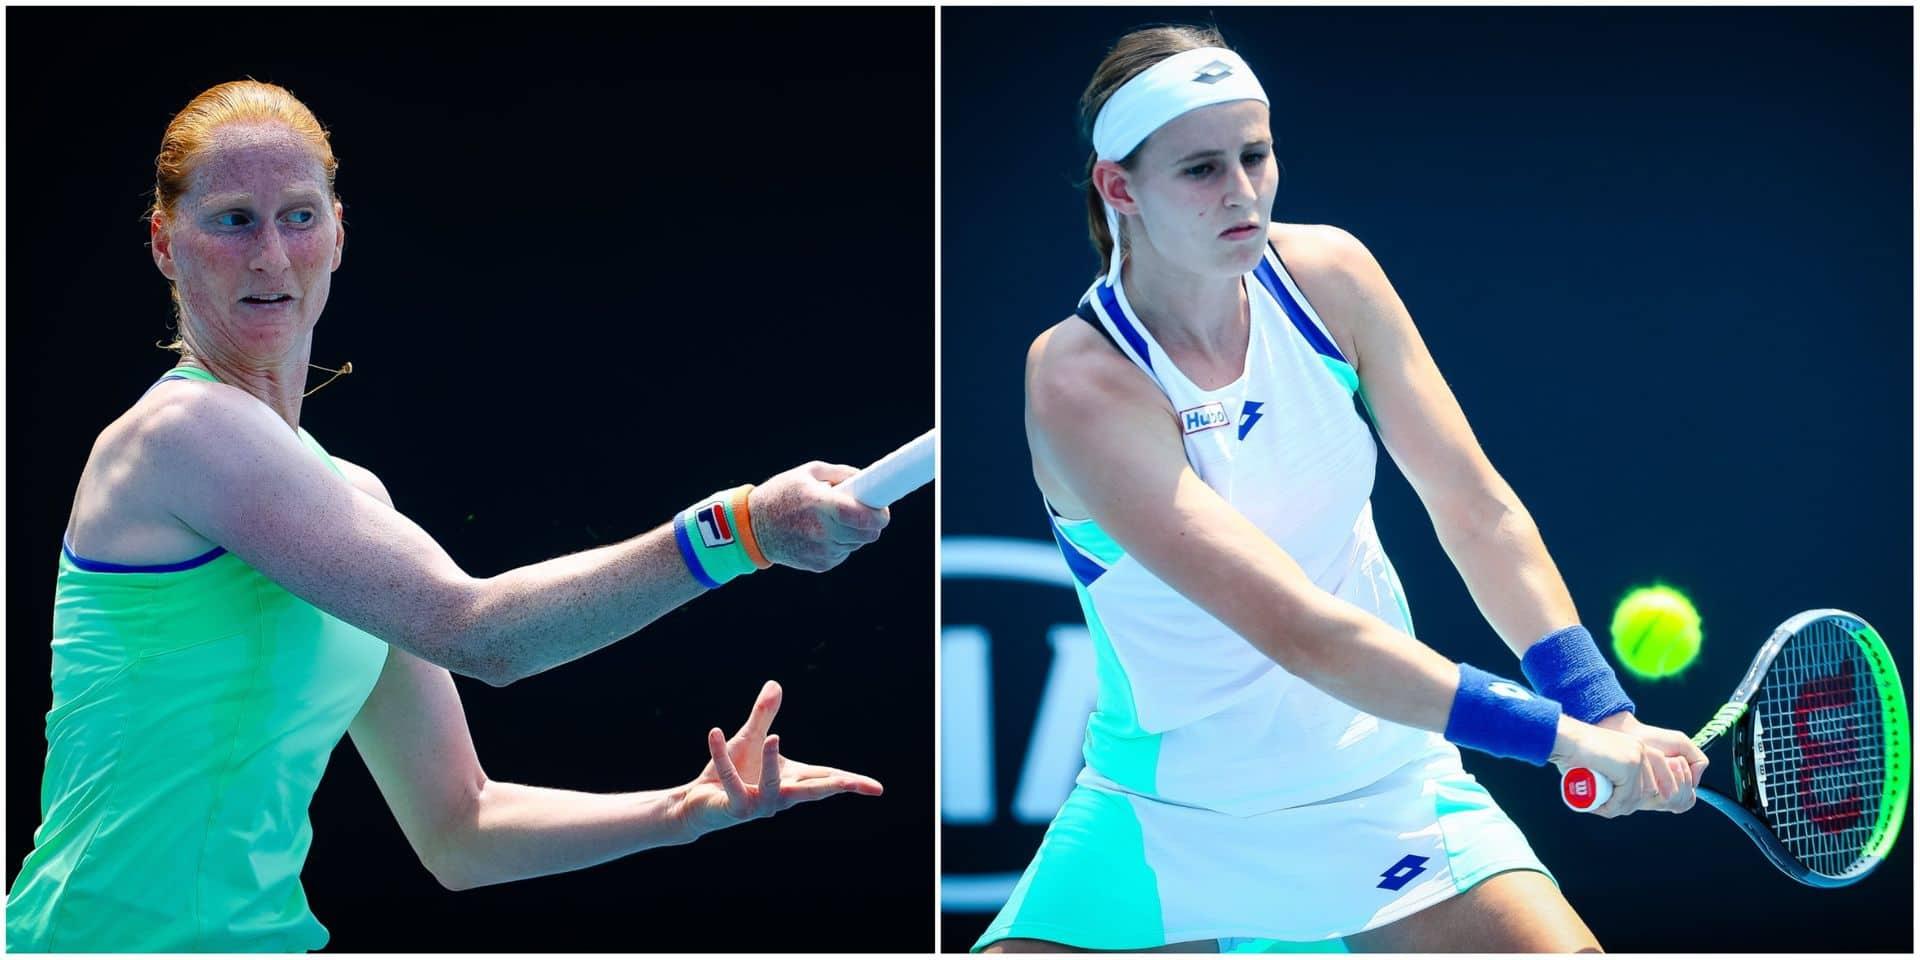 Open d'Australie: Minnen qualifiée, Van Uytvanck corrigée, Flipkens échoue dans sa remontada